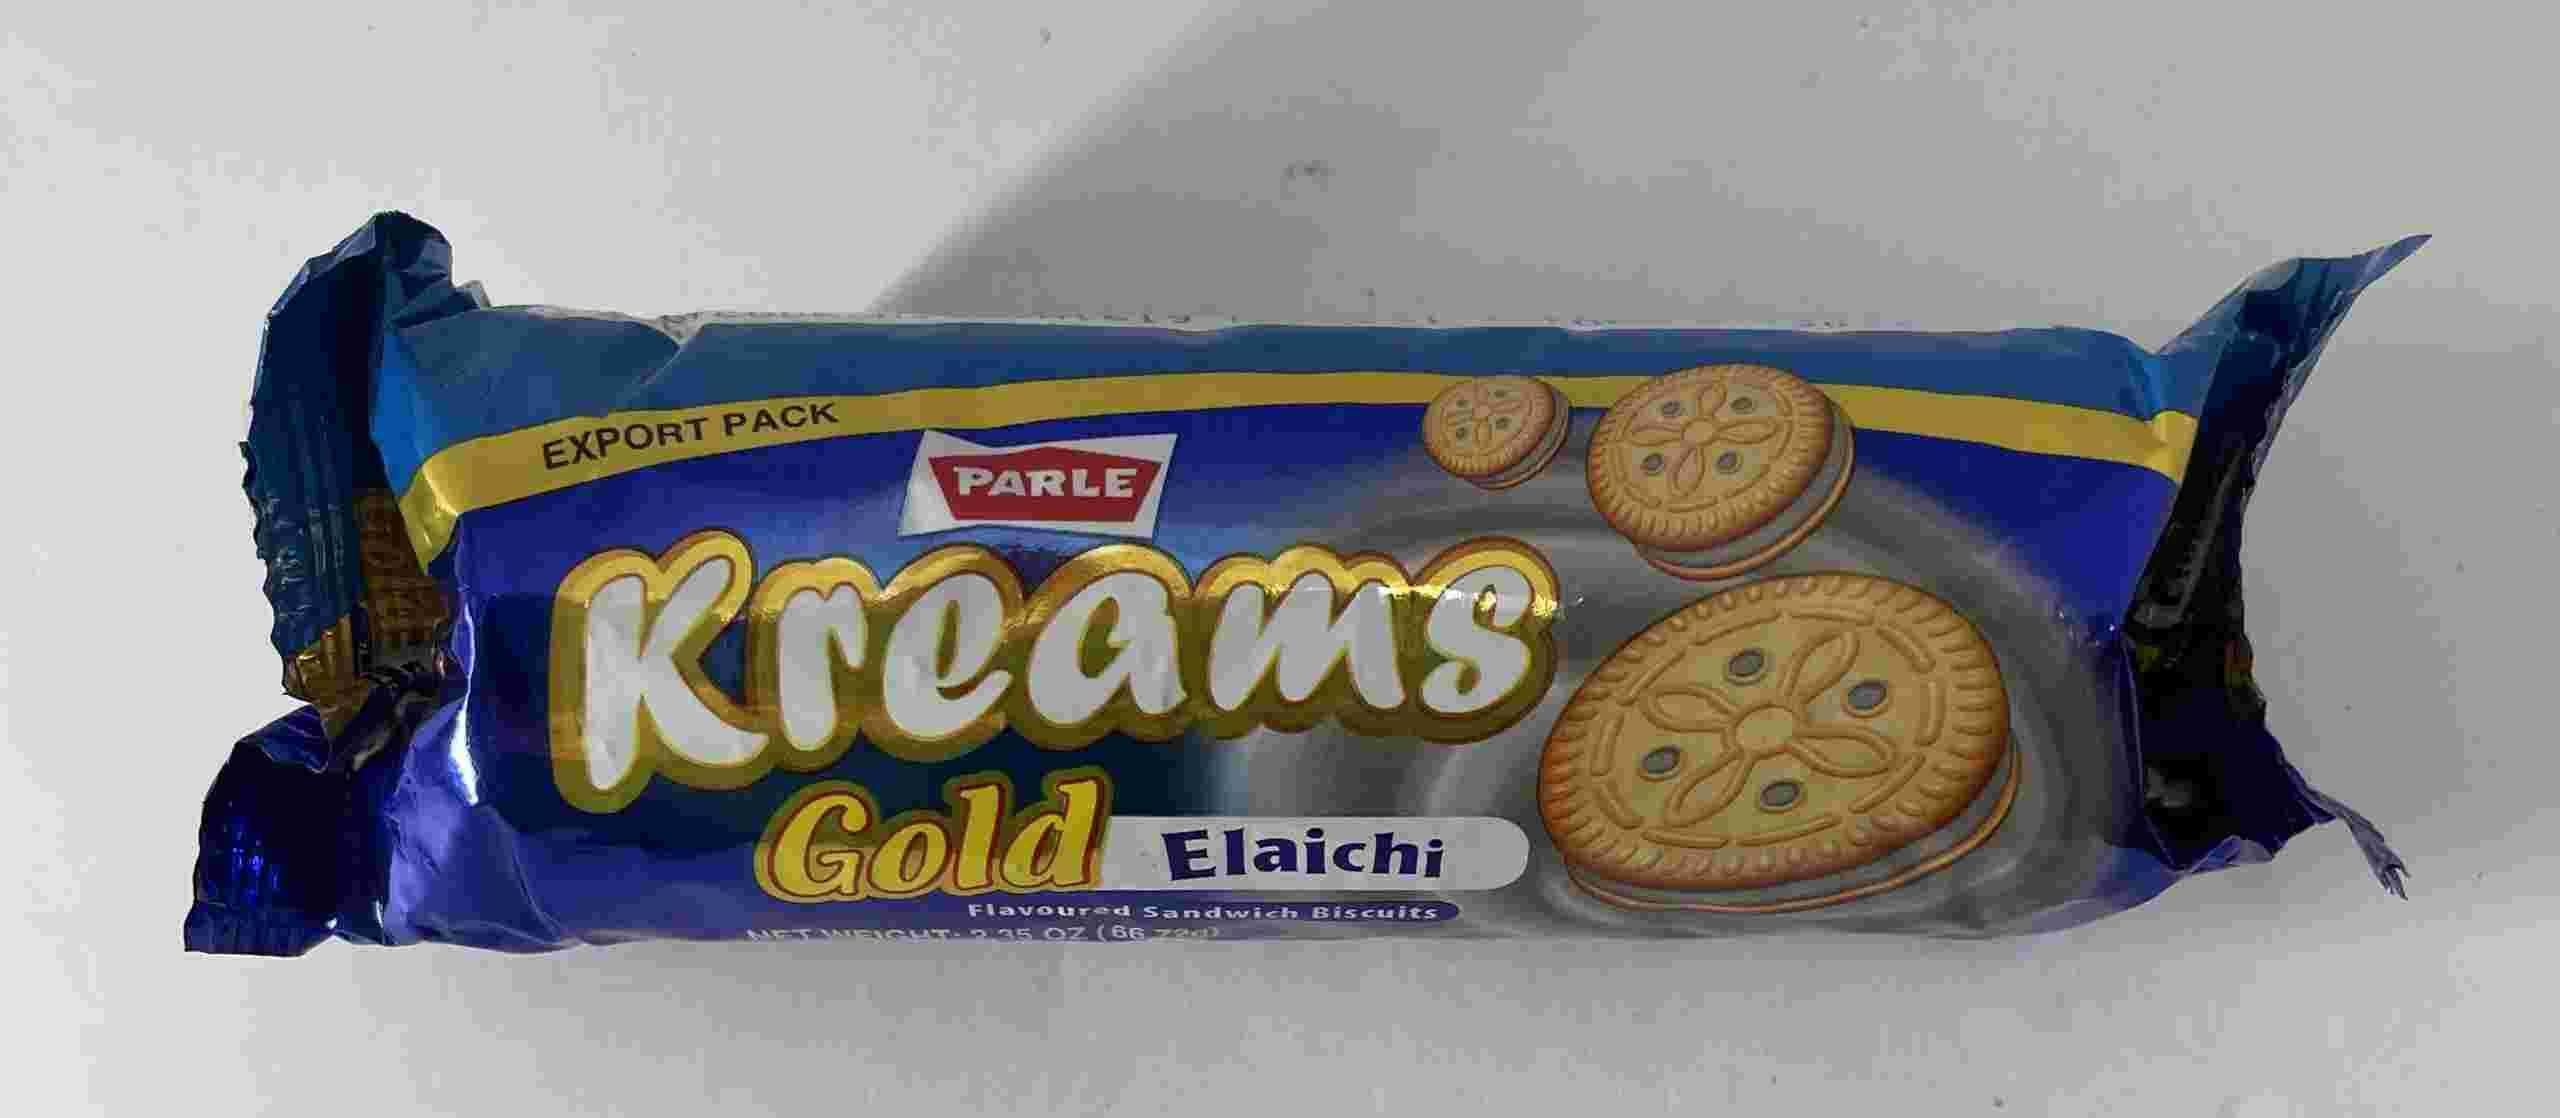 Parle Kreams Gold Elachi